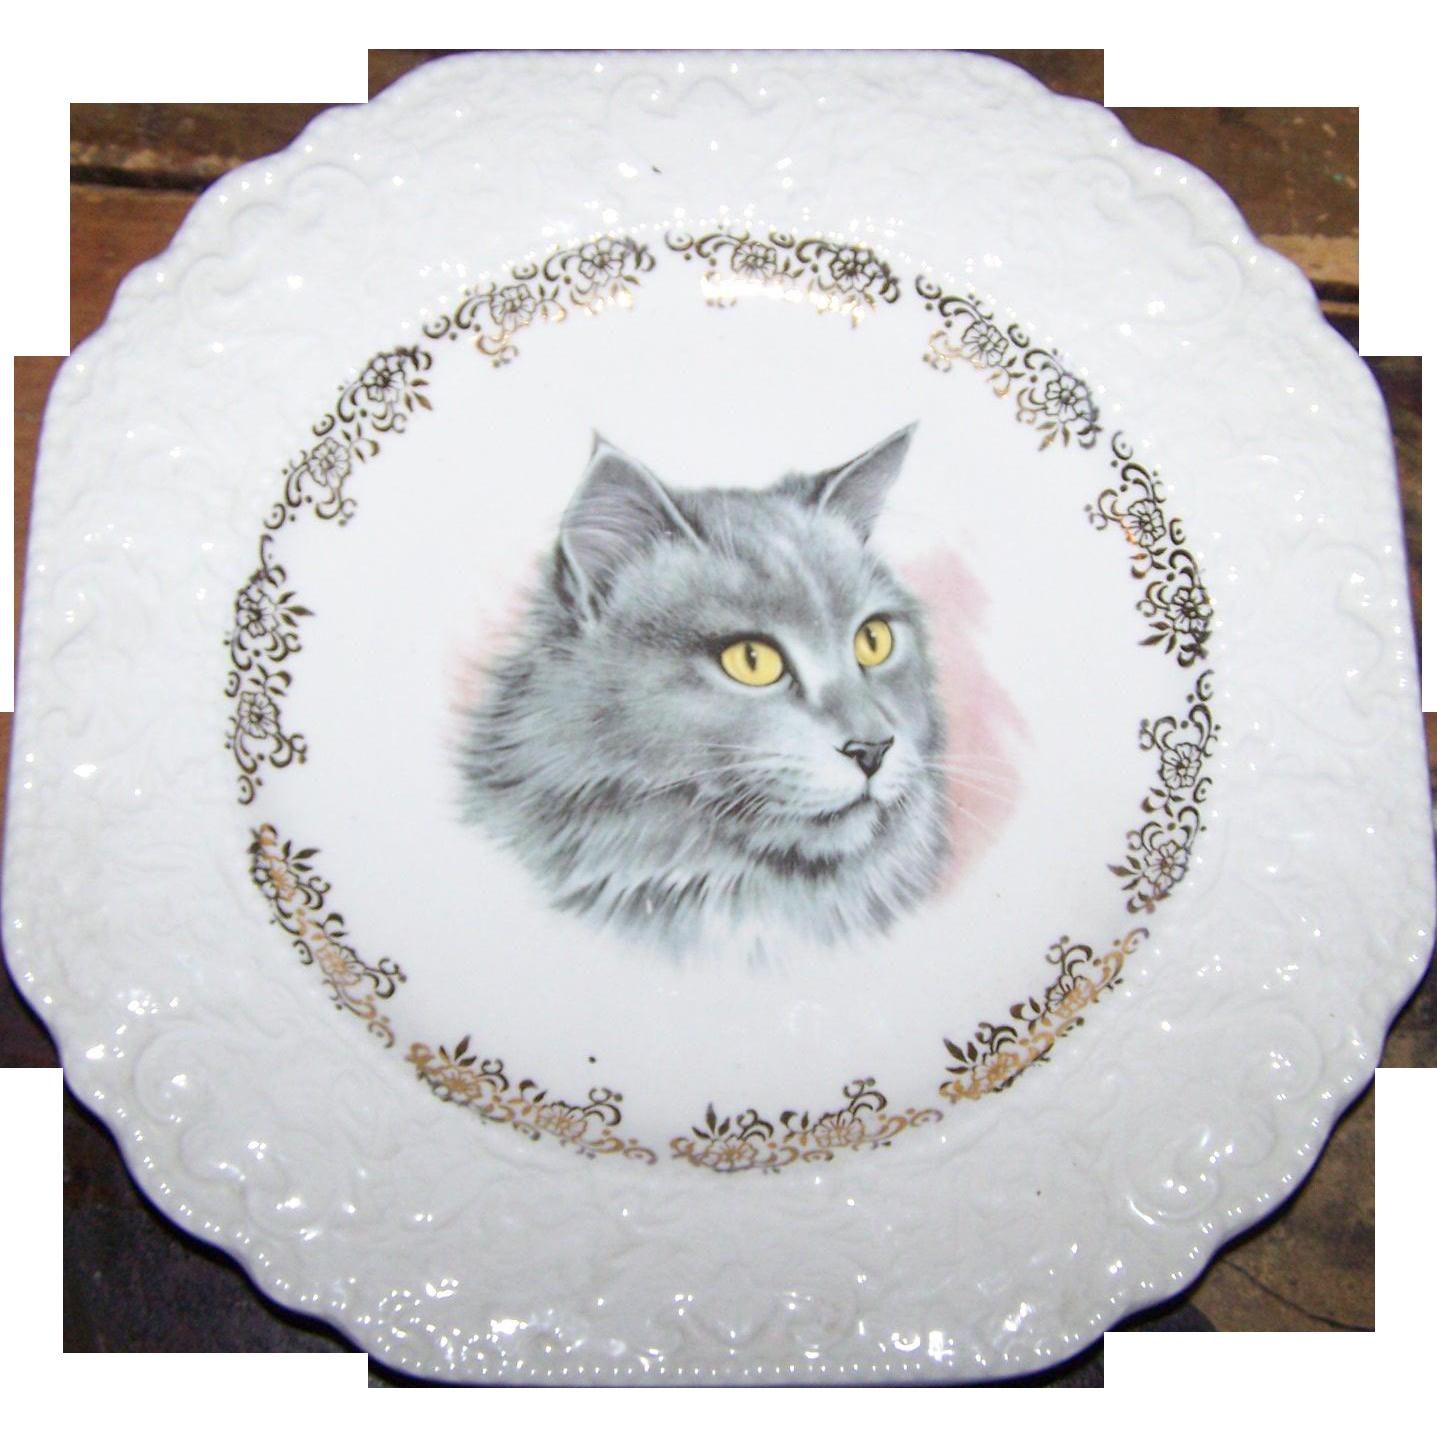 Sweet Decorative EMbossed Feline Kitty Cat Portrait Plate Lord Nelson Pottery MI England